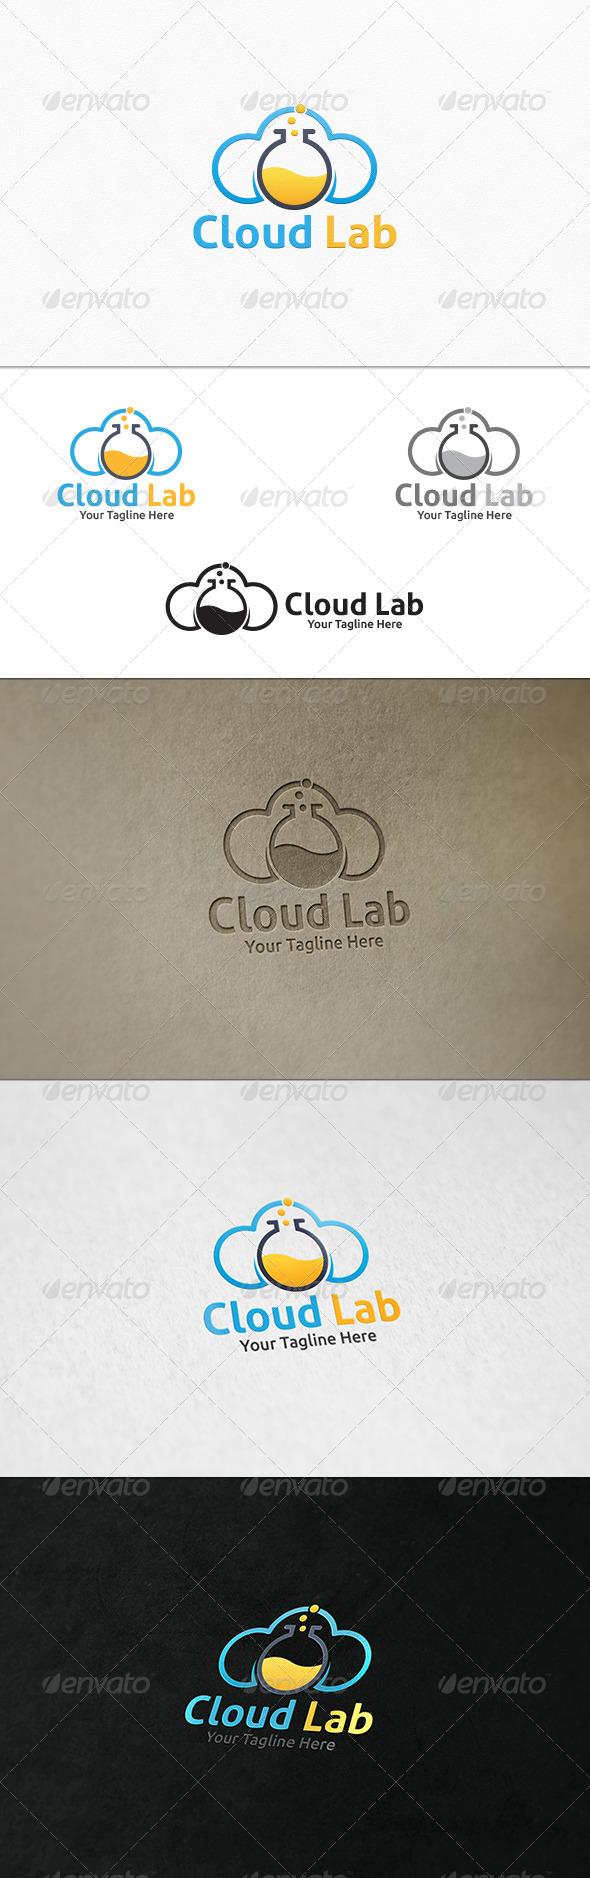 GraphicRiver Cloud Lab Logo Template 7597404